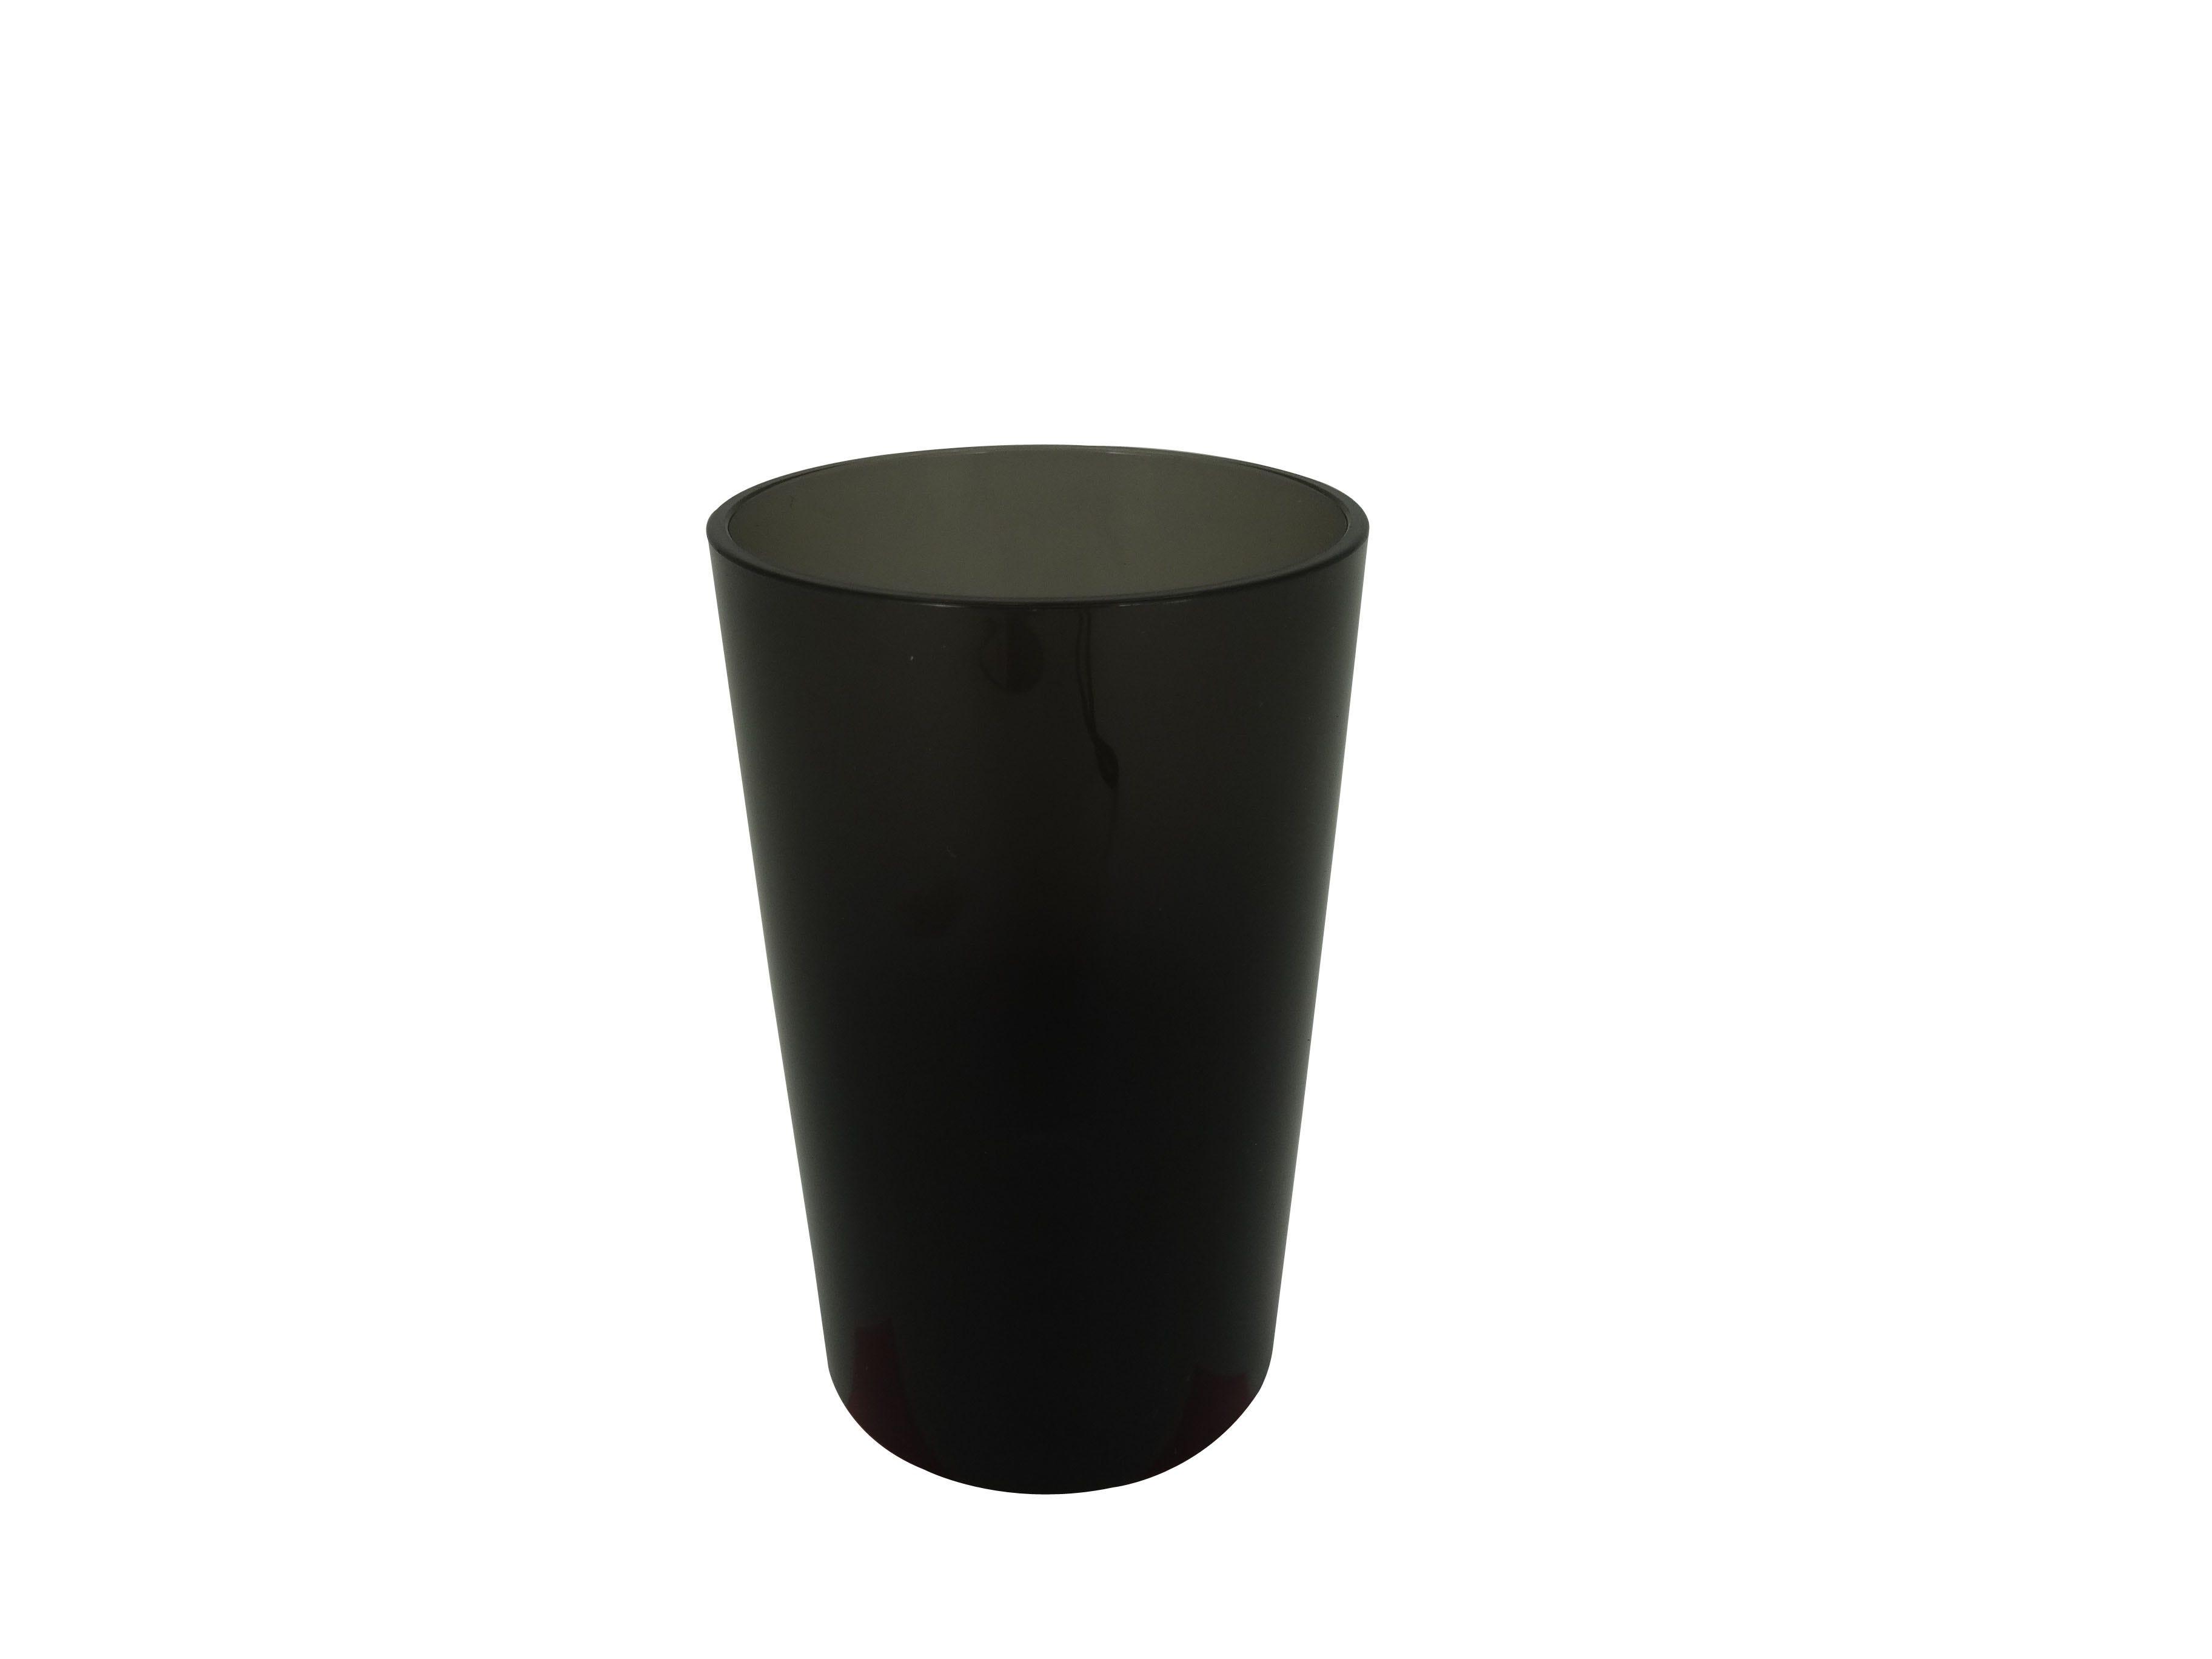 Vaso Namaro Design™, en gris humo